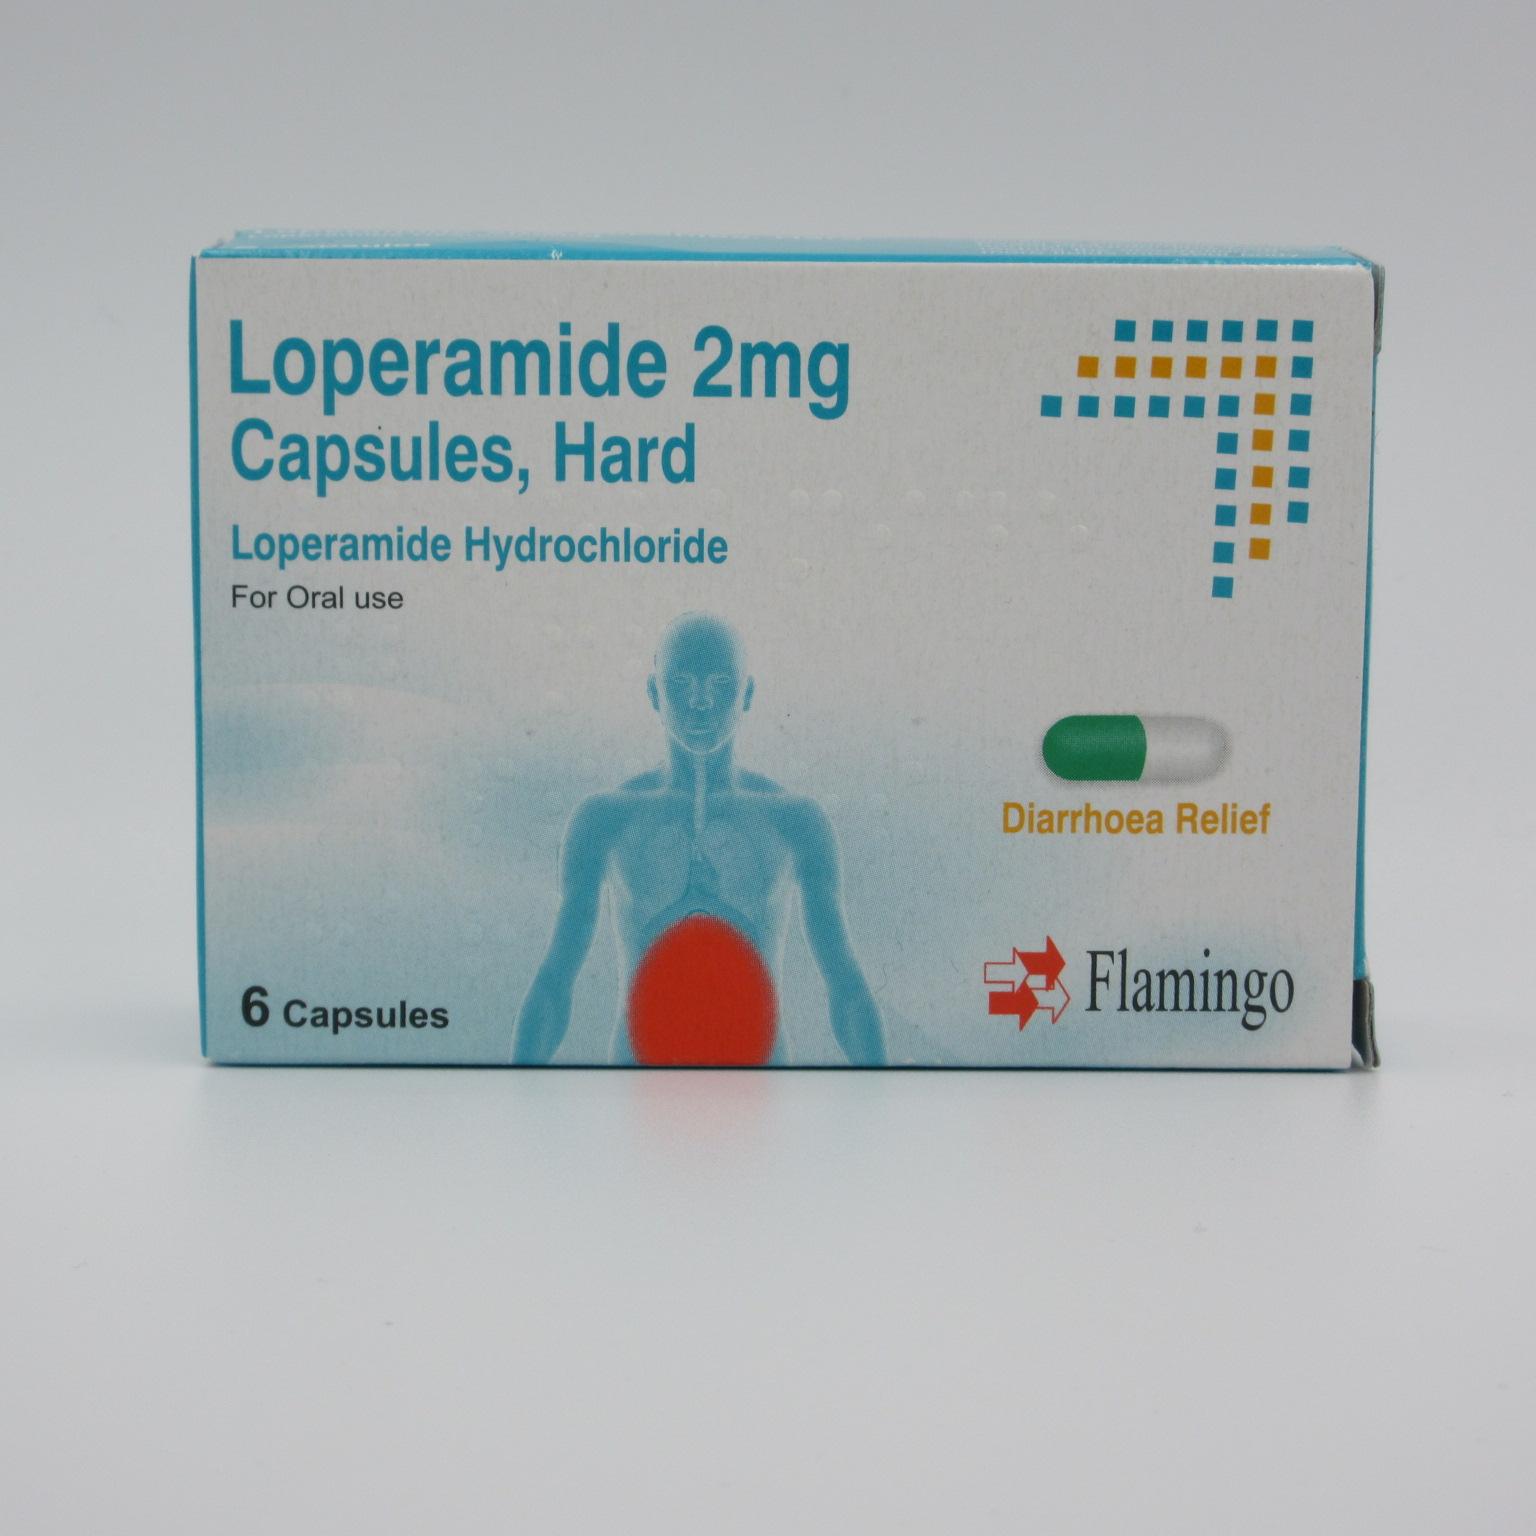 Flamingo Loperamide Diarrhoea Relief